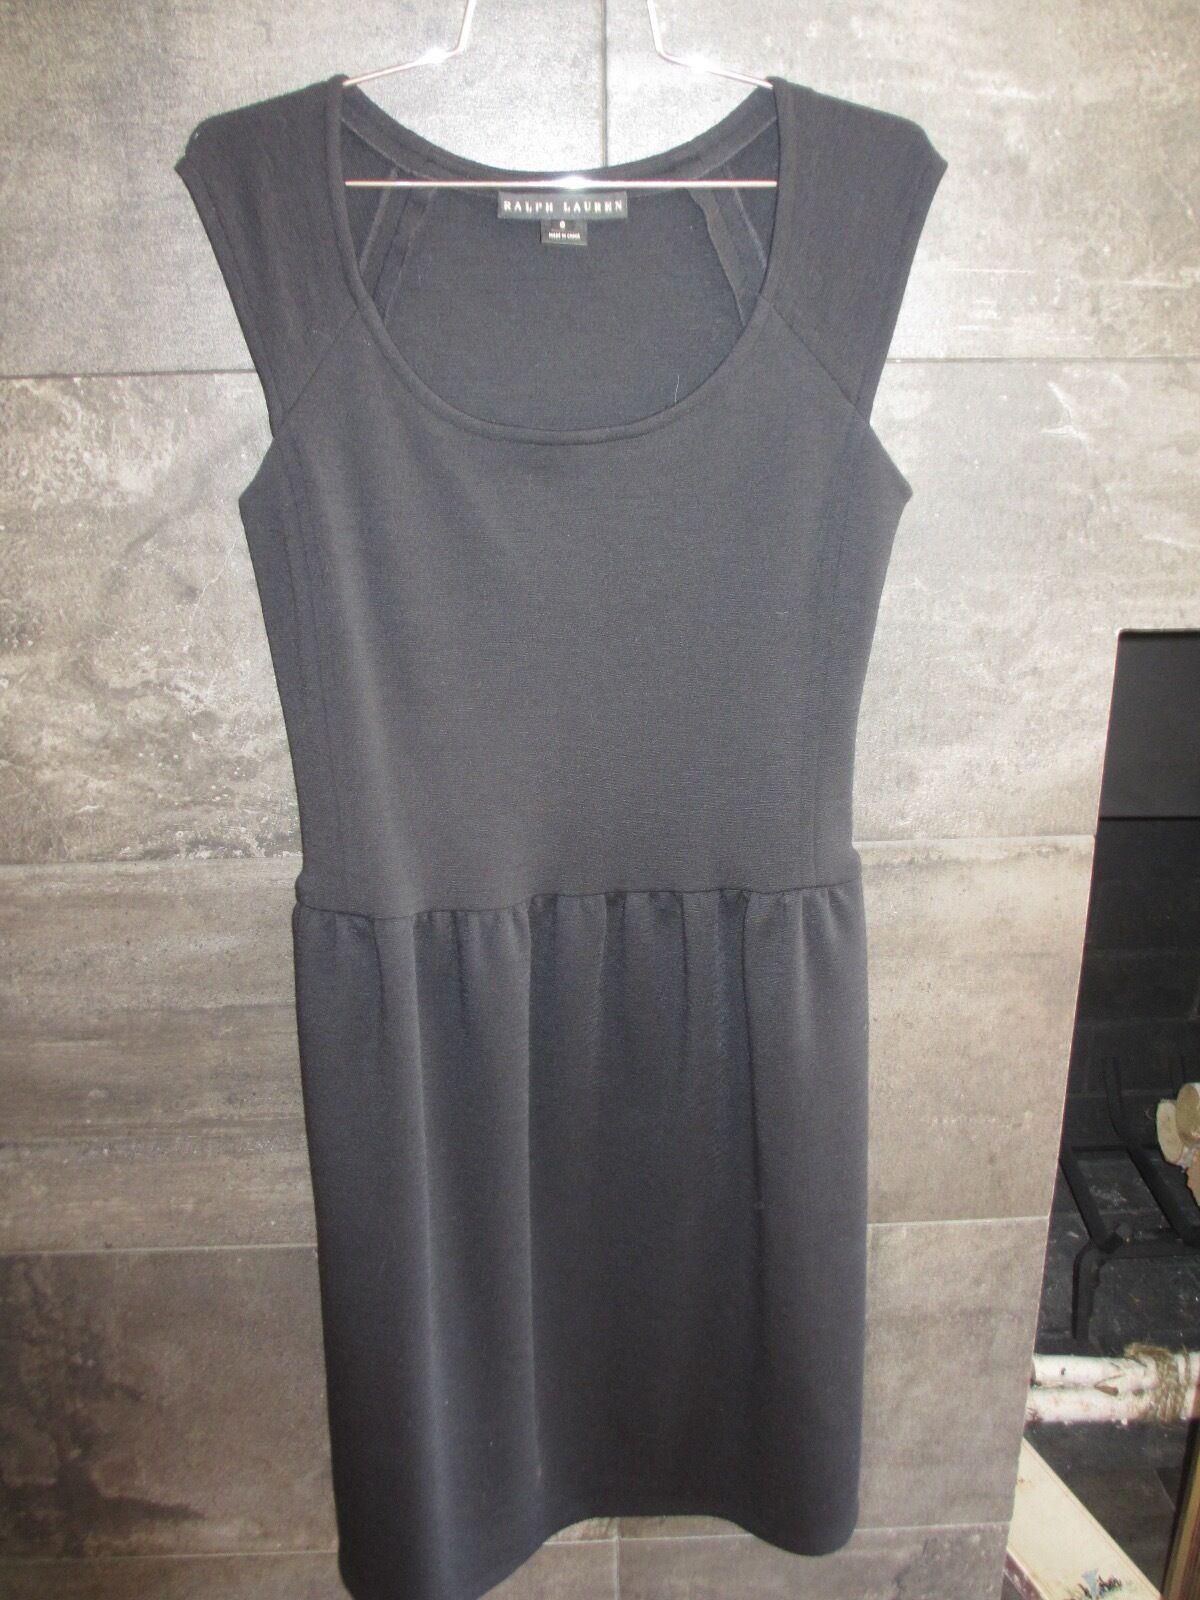 Ralph Lauren schwarz label little wool blend sleeveless schwarz dress Größe 6